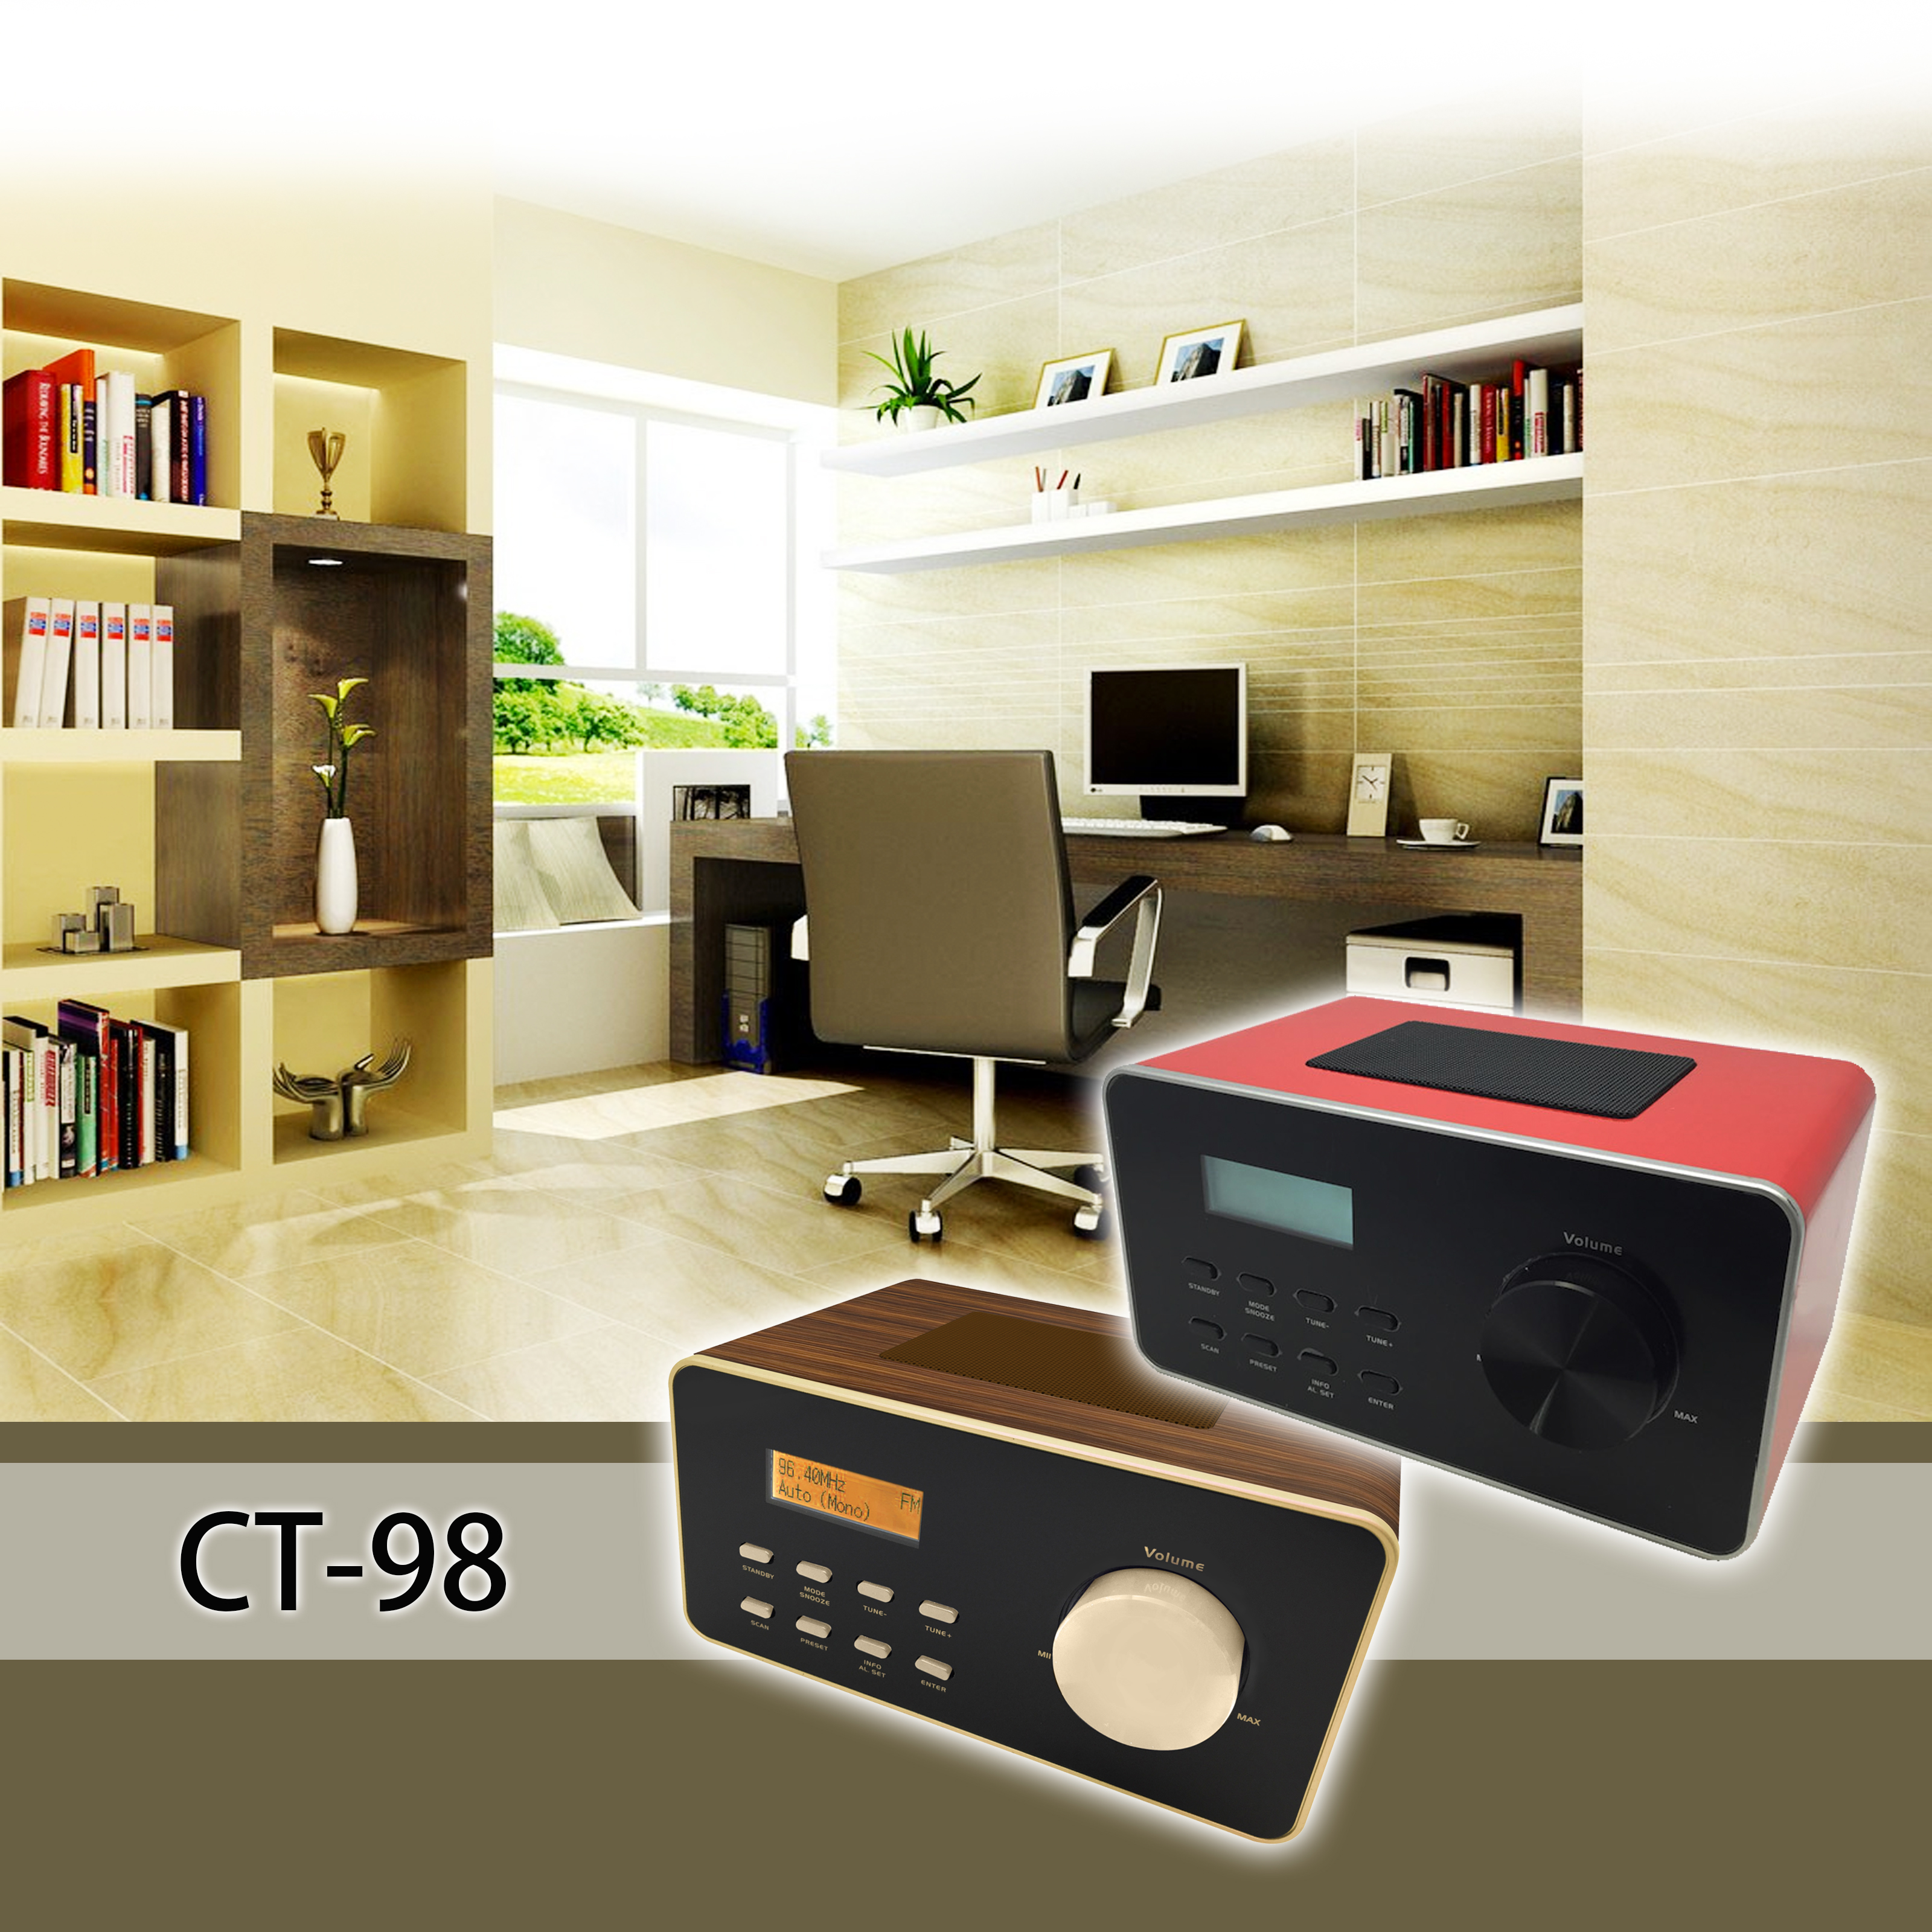 CT-98 Study Room.jpg